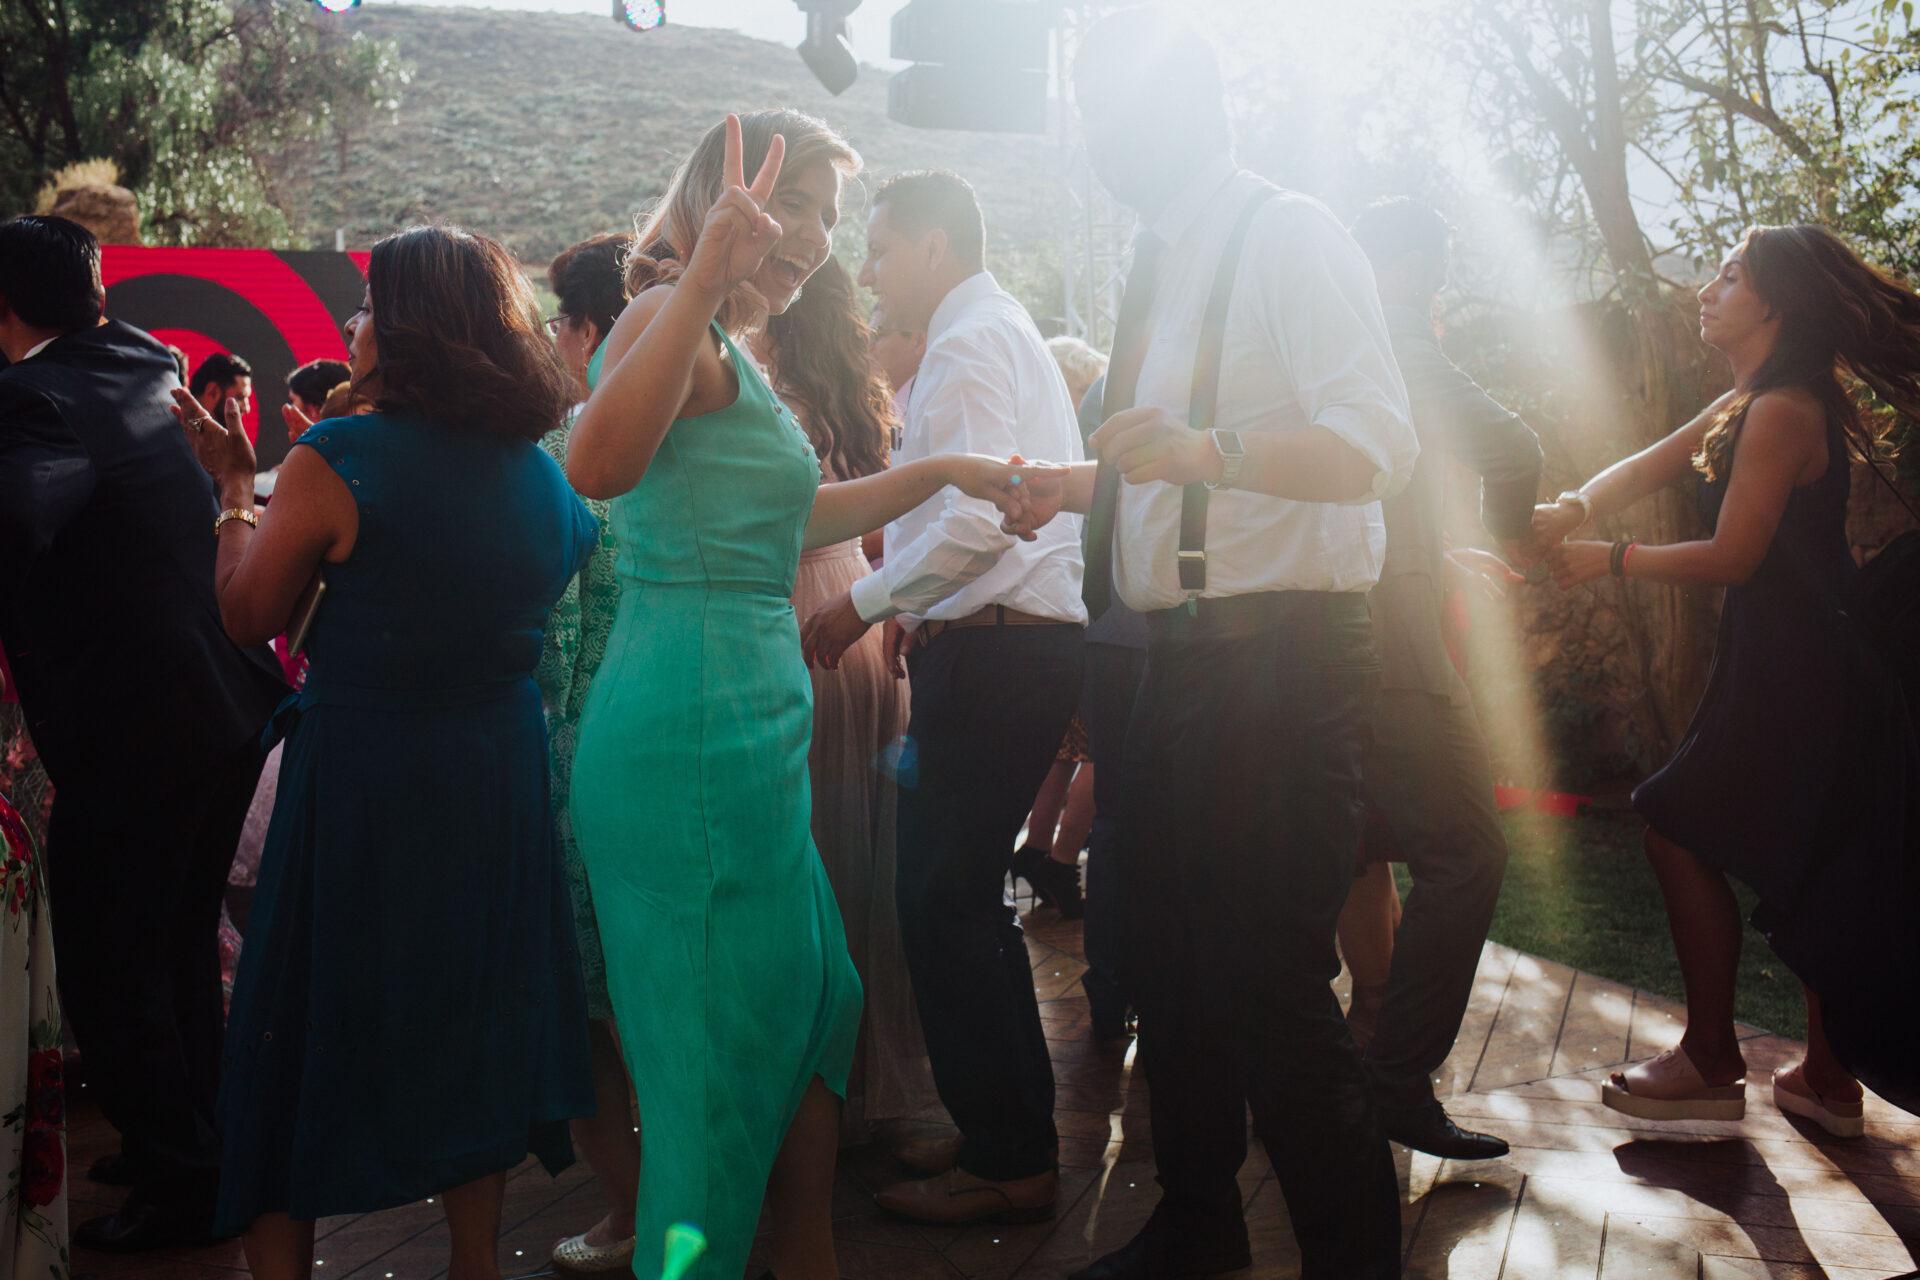 javier_noriega_fotografo_bodas_exhacienda_las_mercedes_zacatecas_wedding_photographer17a